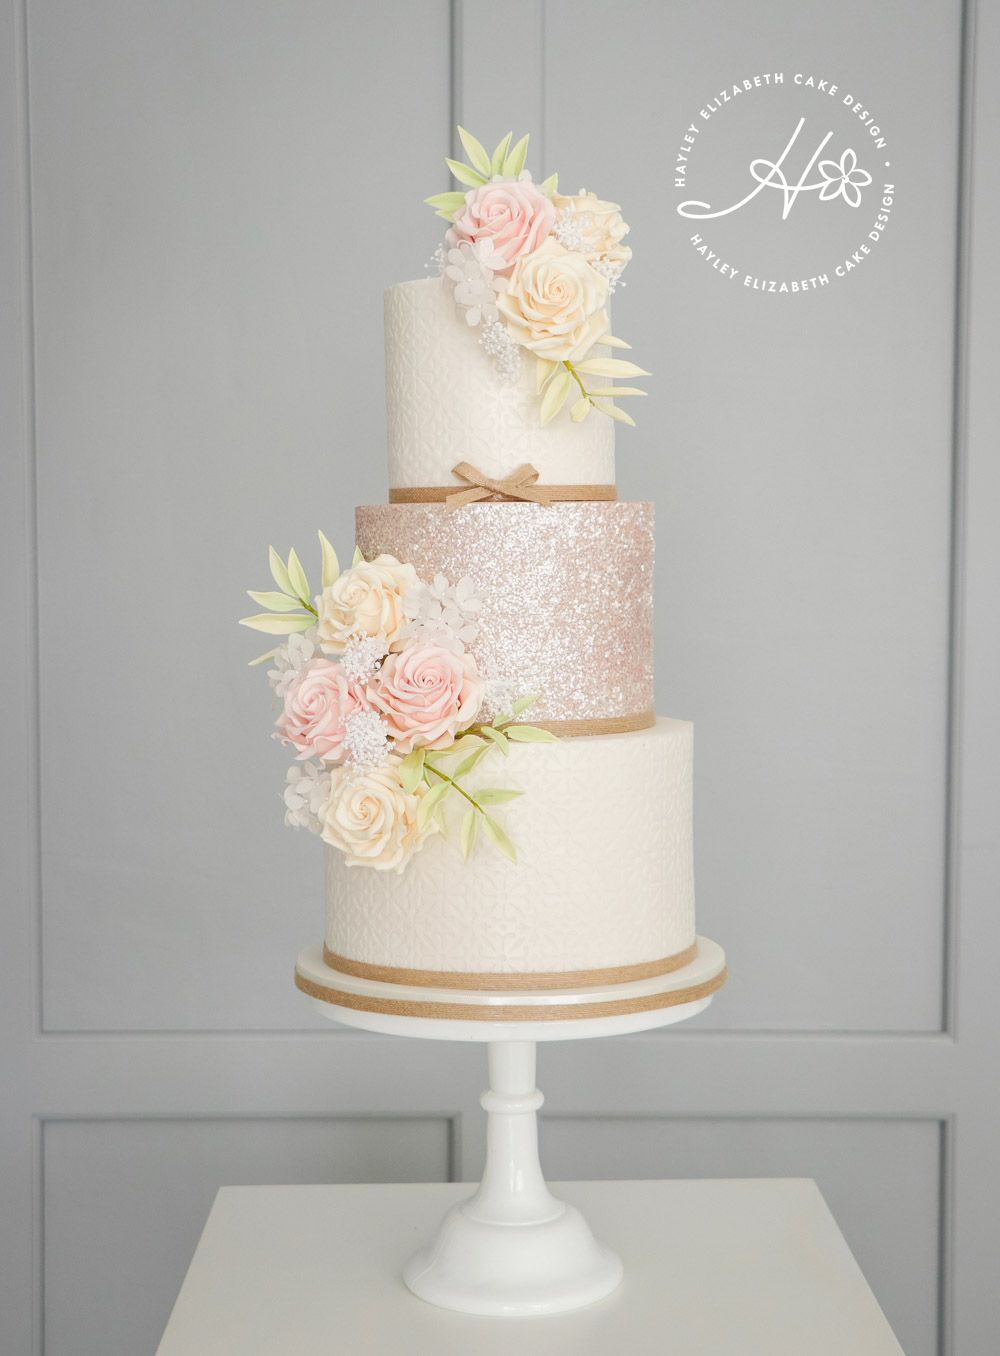 Luxury Wedding Cakes Dessert Tables In Dorset Hampshire In 2019